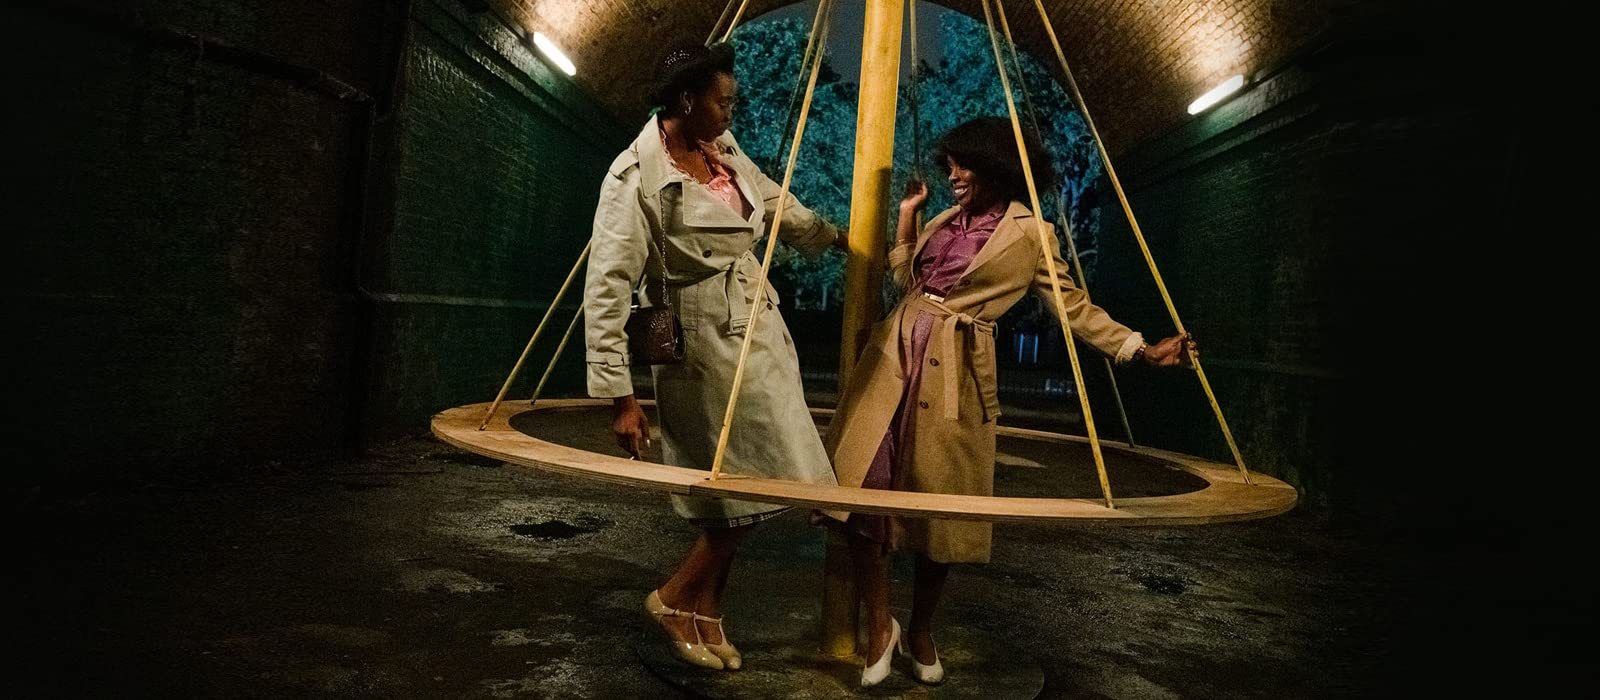 Martha and Patty having fun on swings